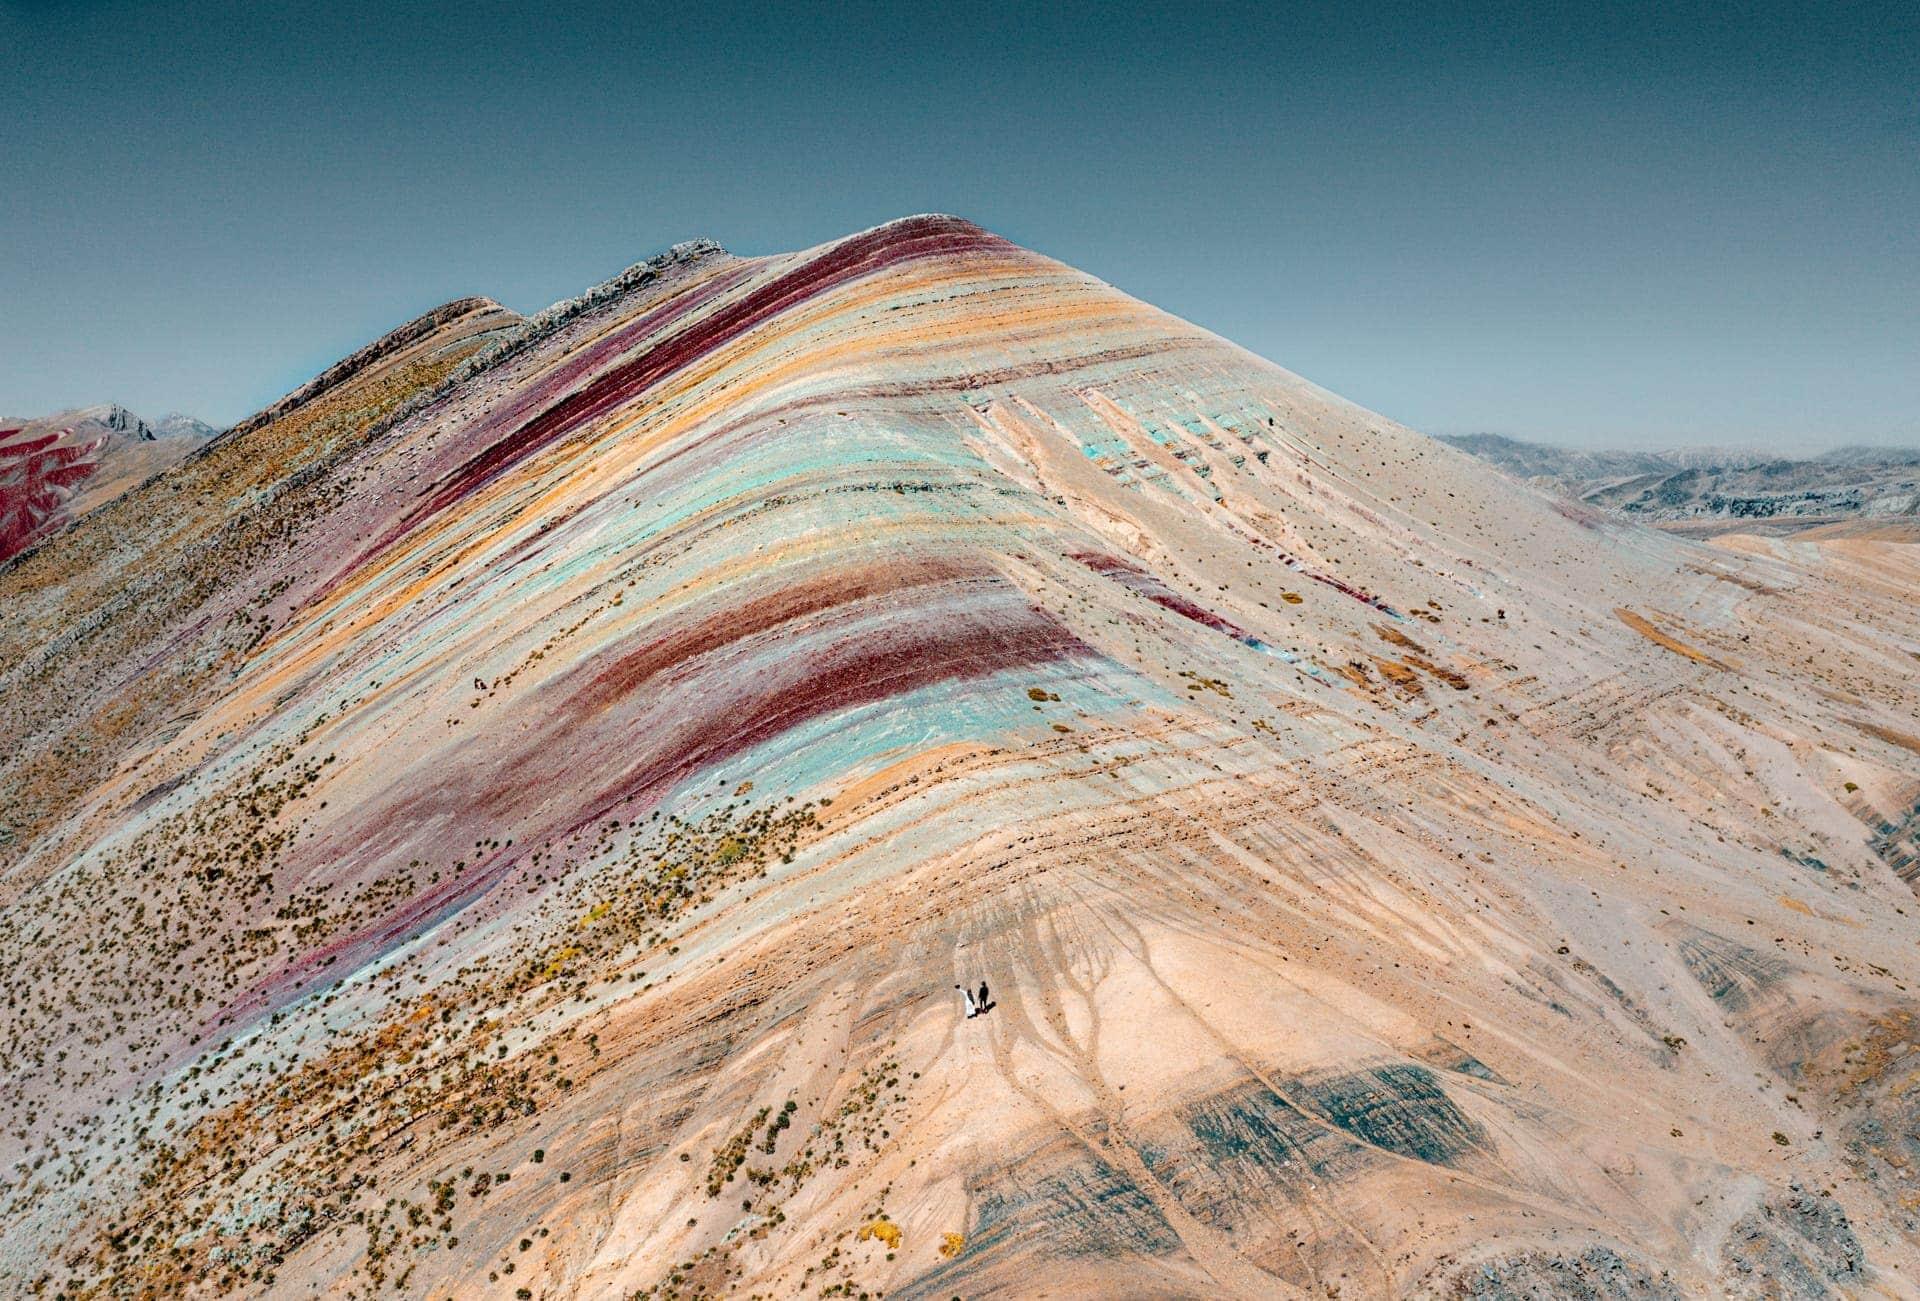 palccoyo rainbow mountain drone